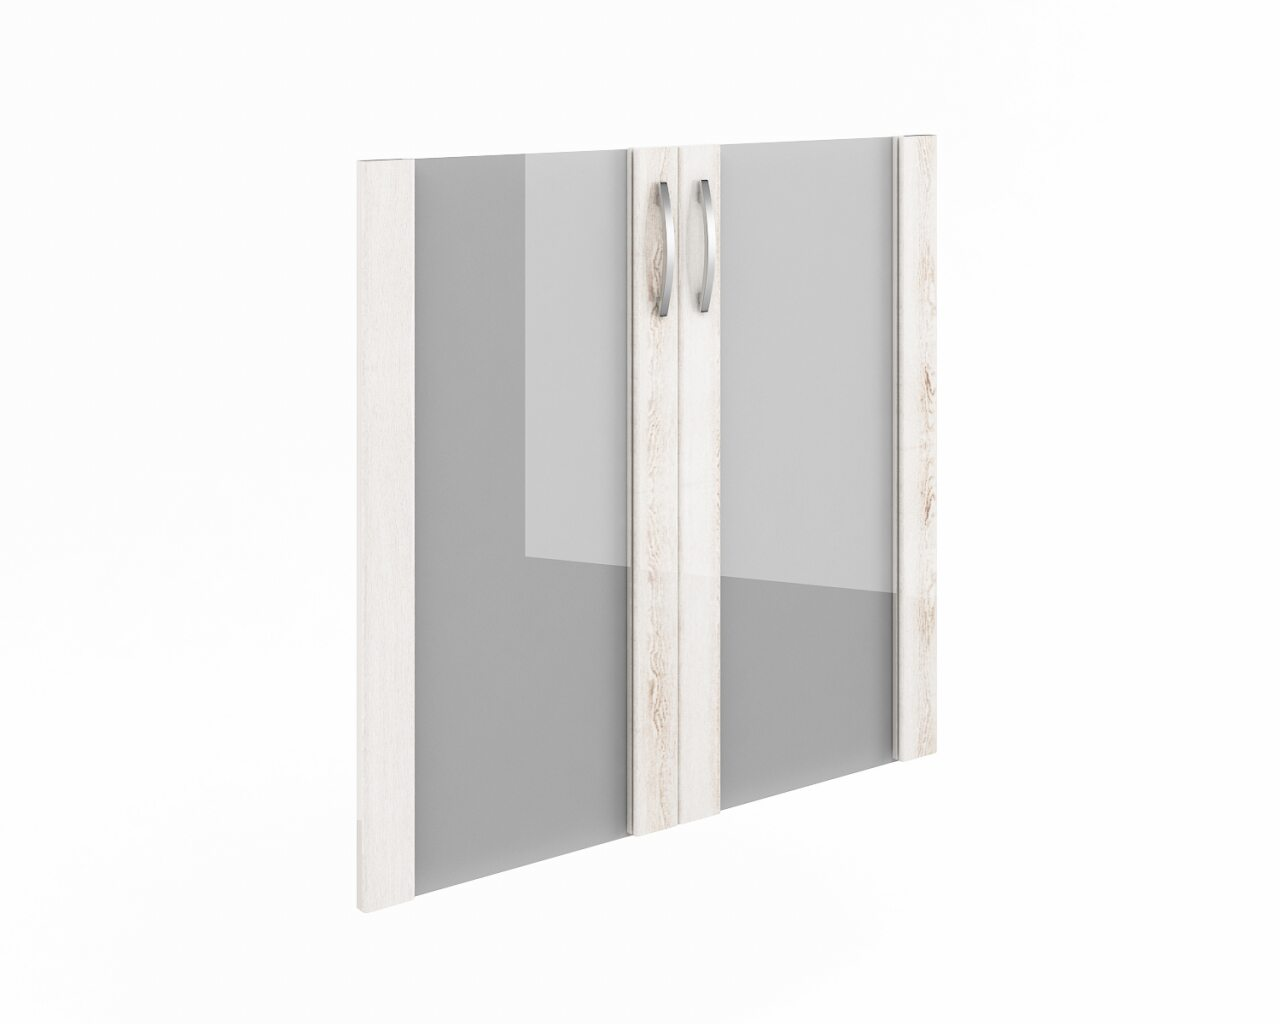 Дверь низкая стекло в рамке МДФ  КОНСУЛ II 40x2x77 - фото 1